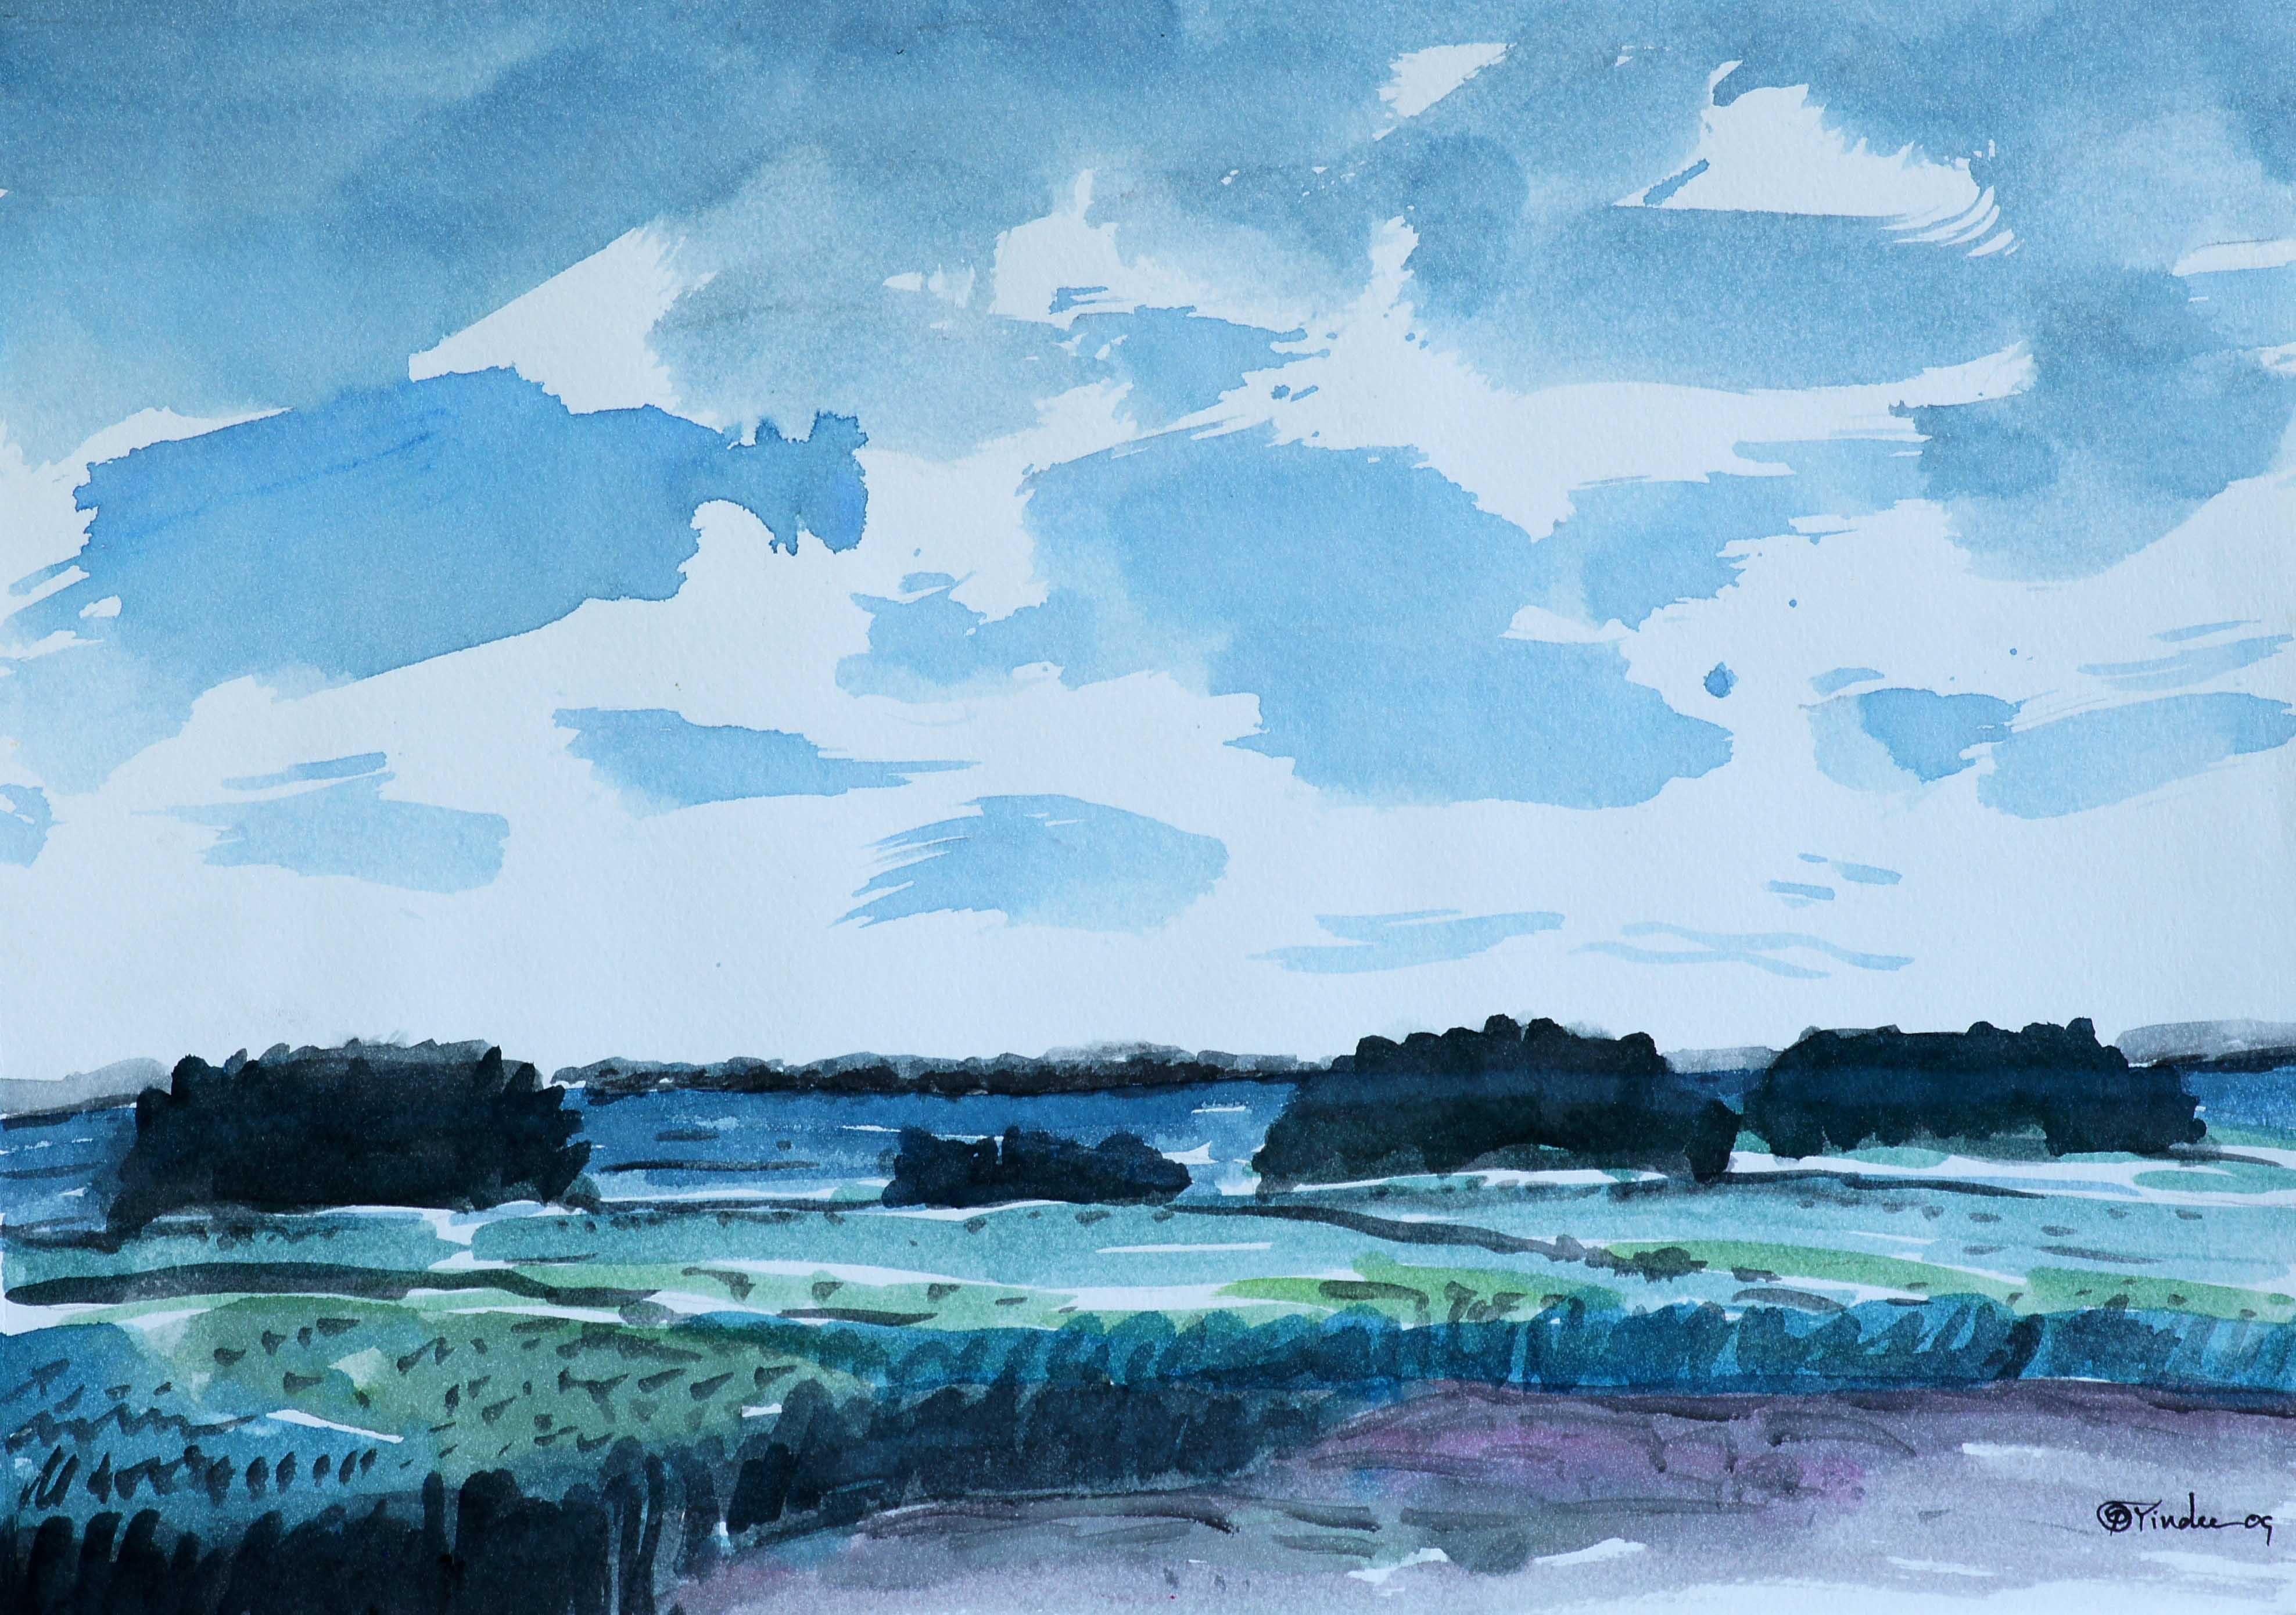 Drawn landscape Pracha by : Drawing 2